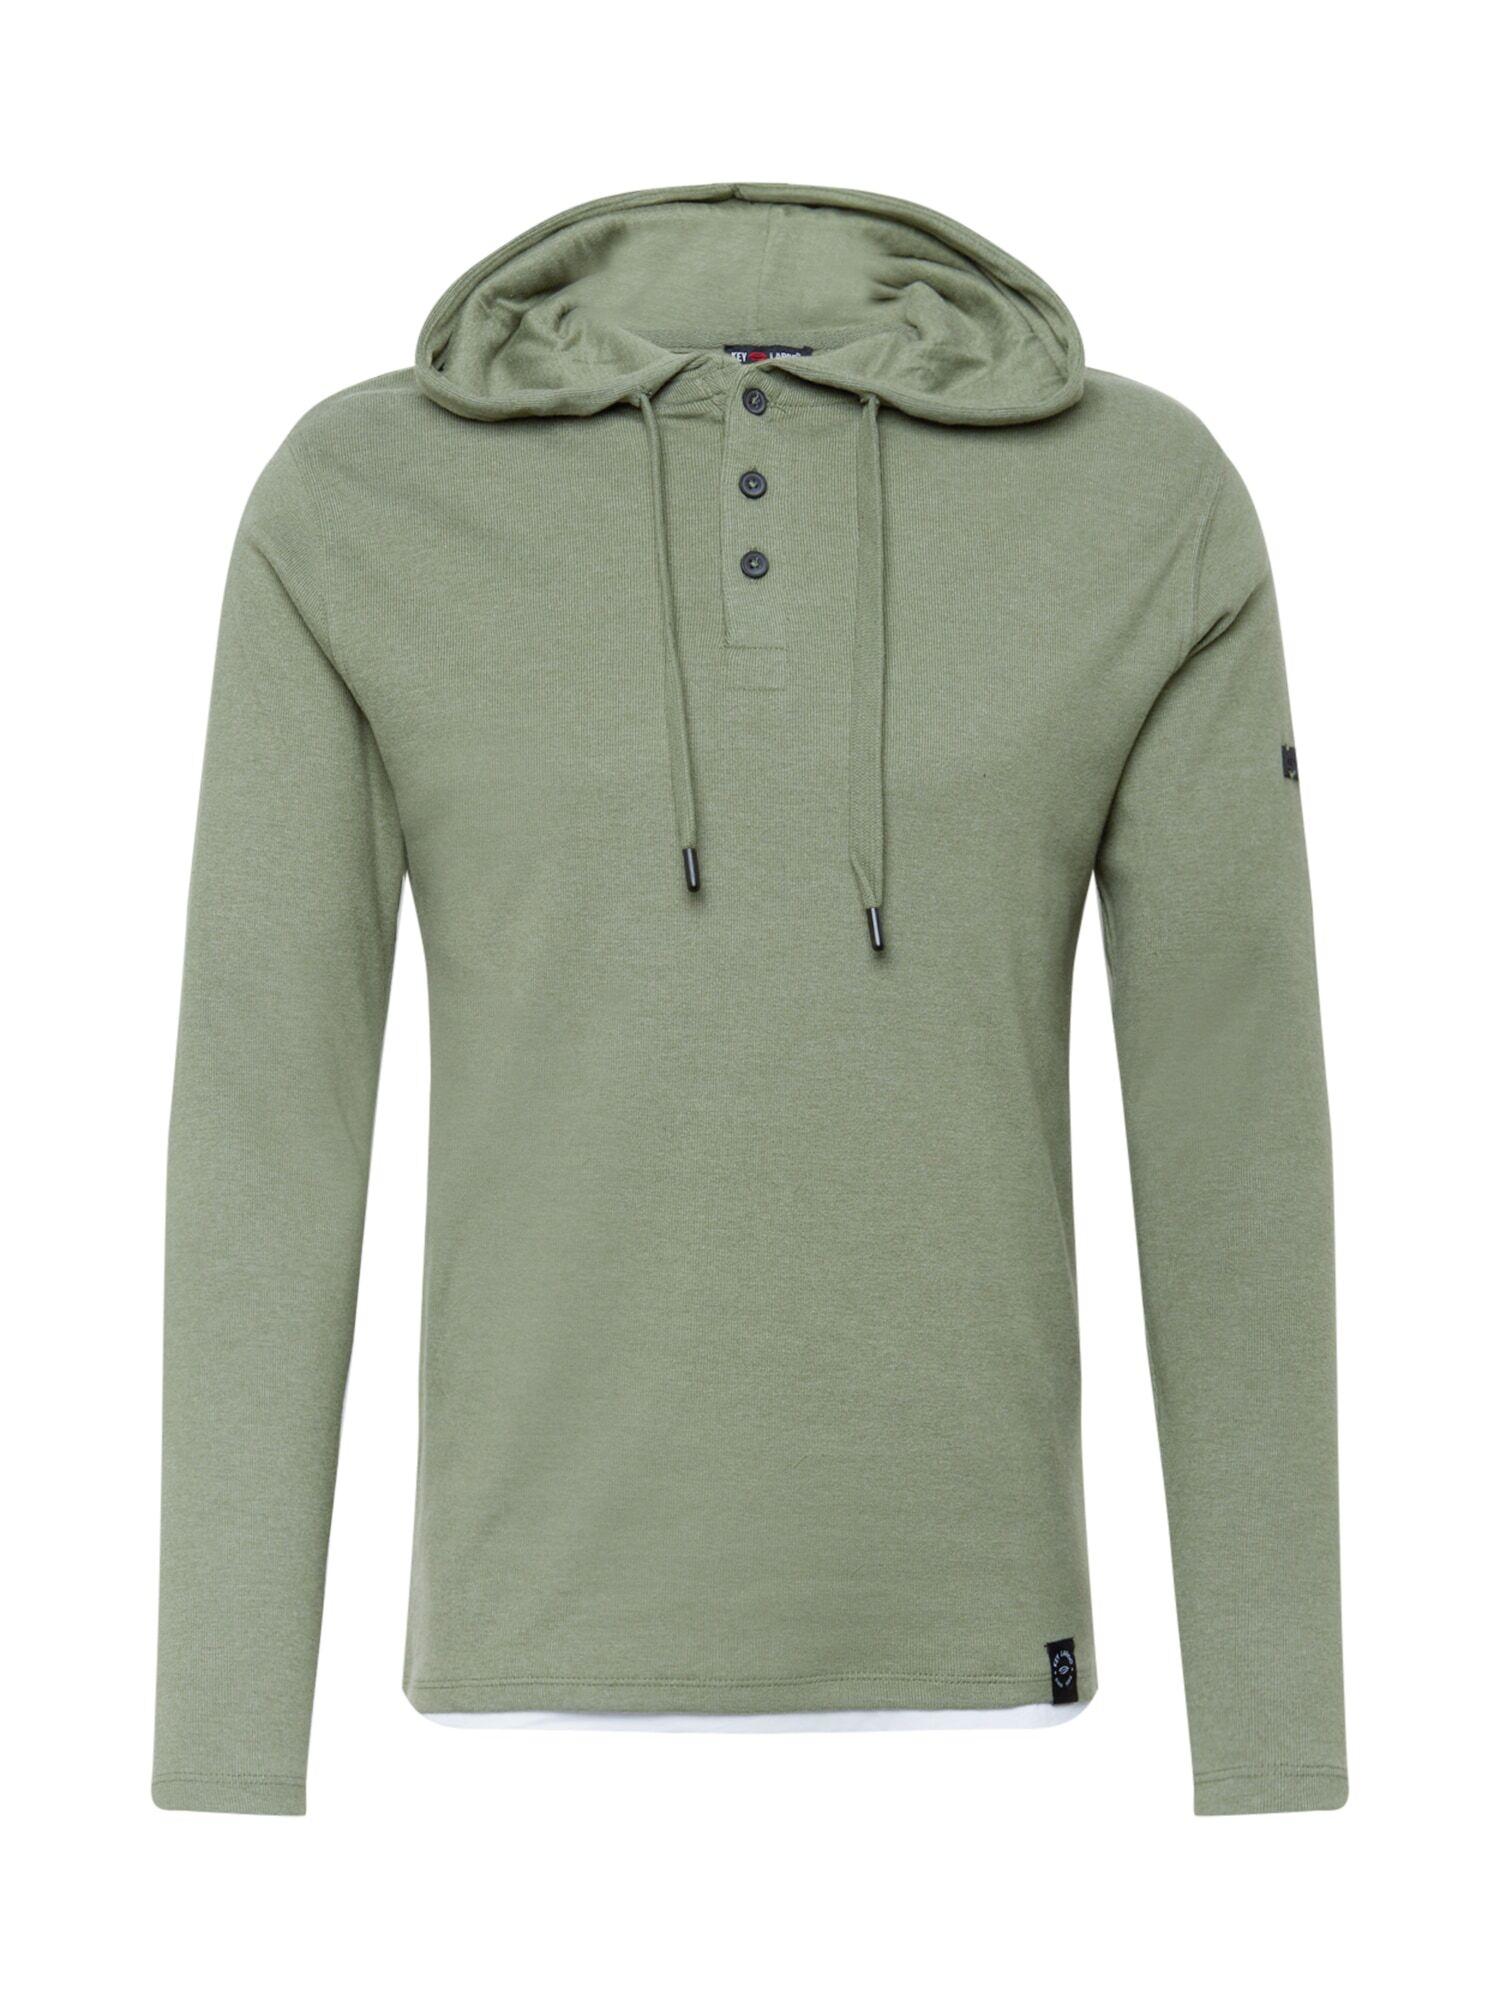 Key Largo Sweat-shirt 'SARAGOSSA'  - Vert - Taille: XXL - male